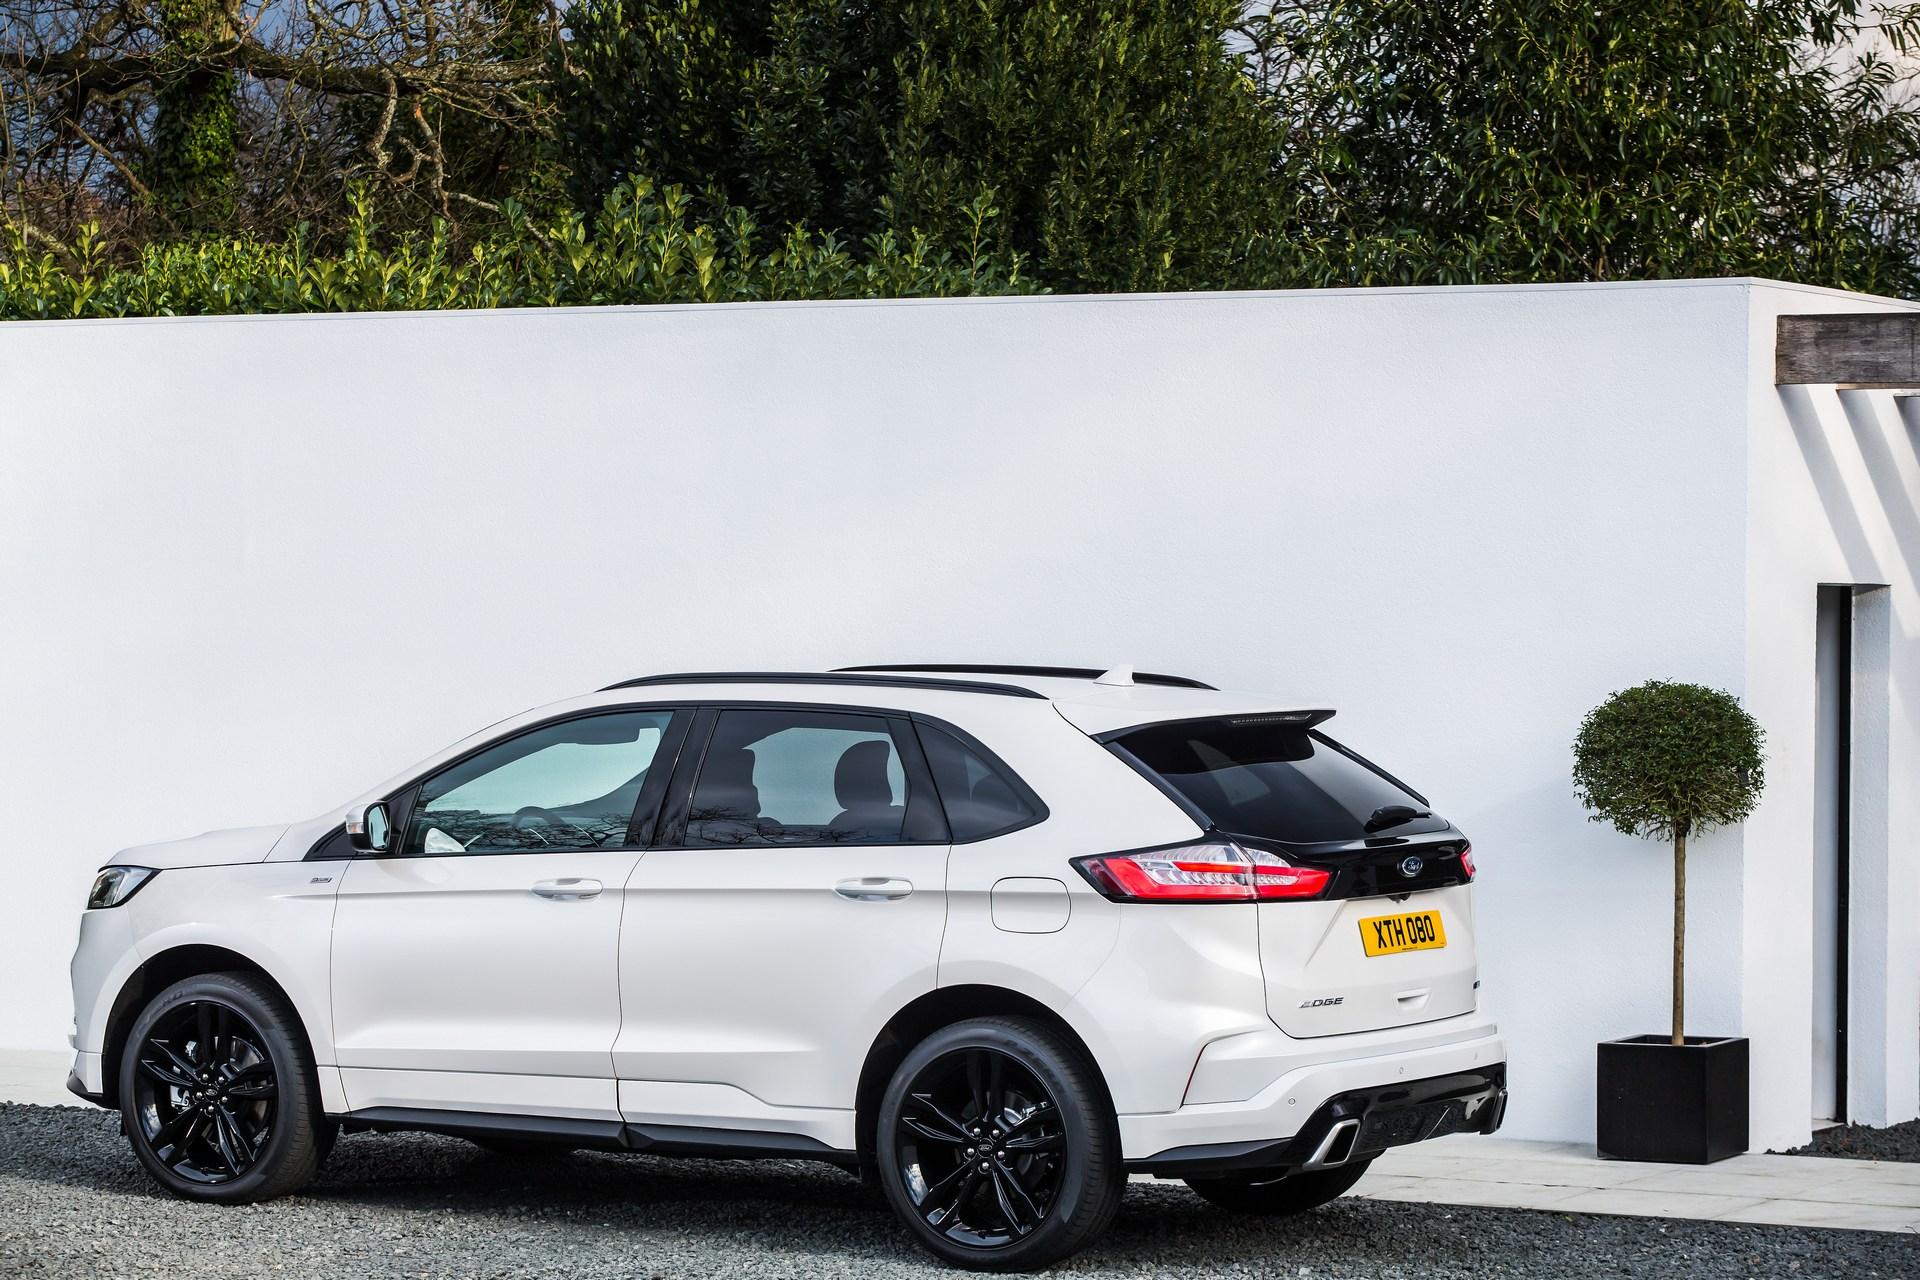 Ford Edge facelift 2018 Euro-Spec (20)